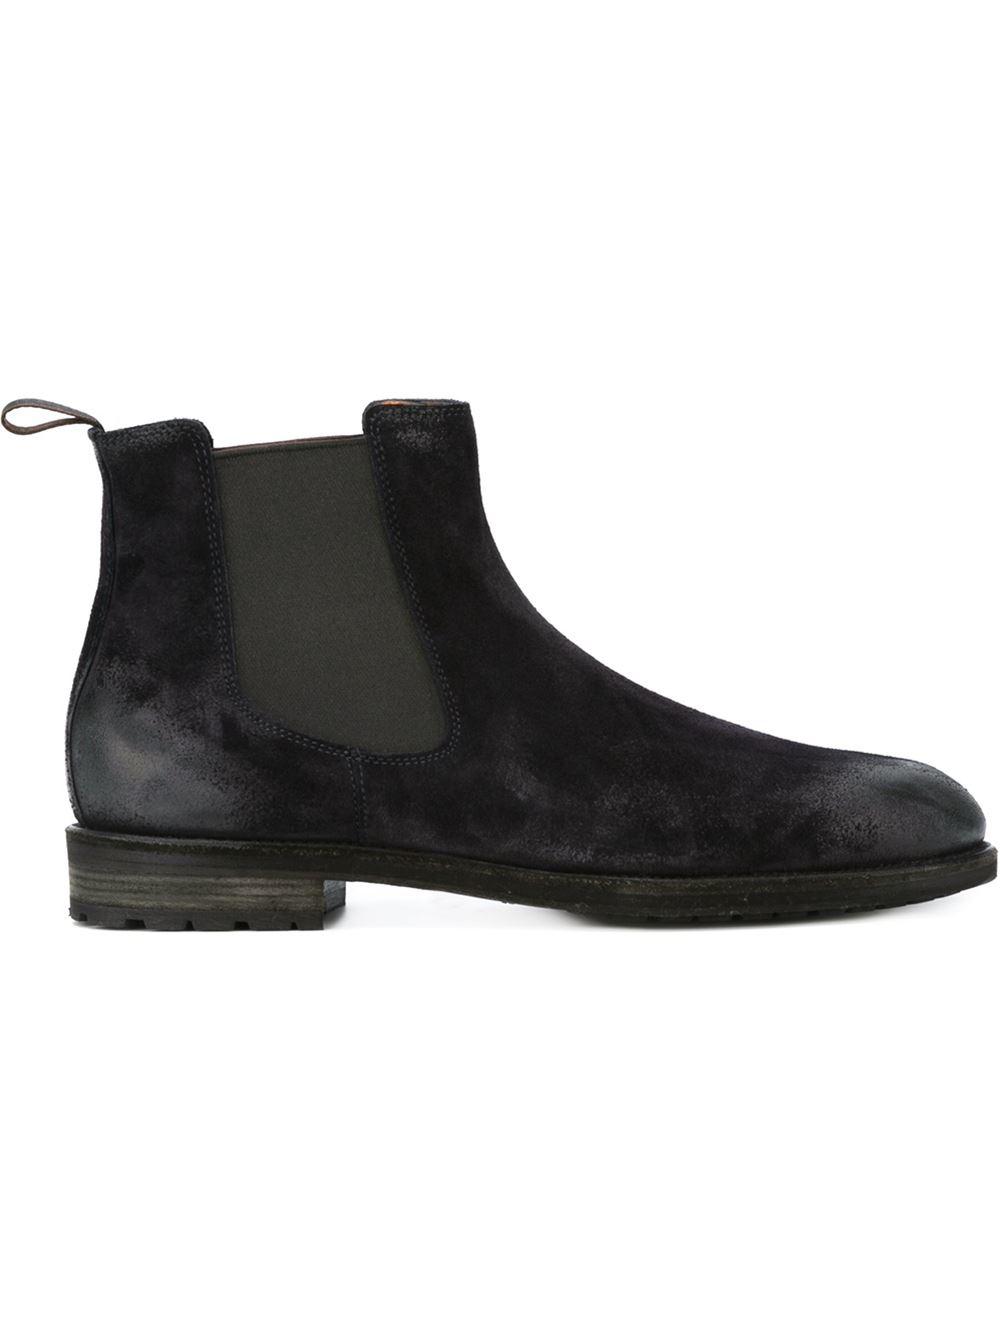 santoni worn out effect chelsea boots in blue for men lyst. Black Bedroom Furniture Sets. Home Design Ideas